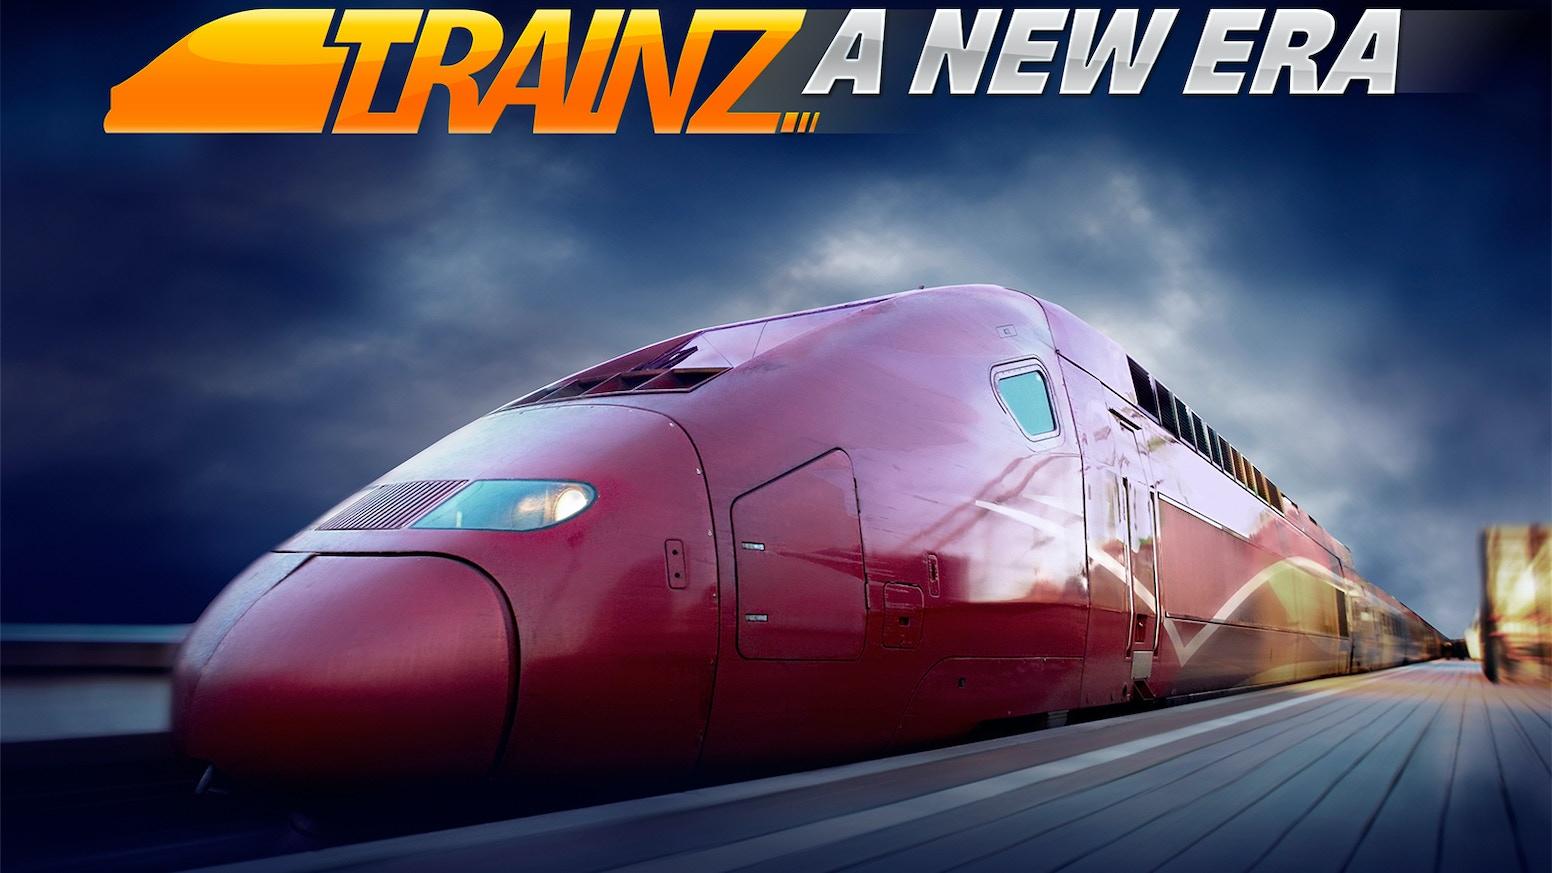 trainz a new era free download